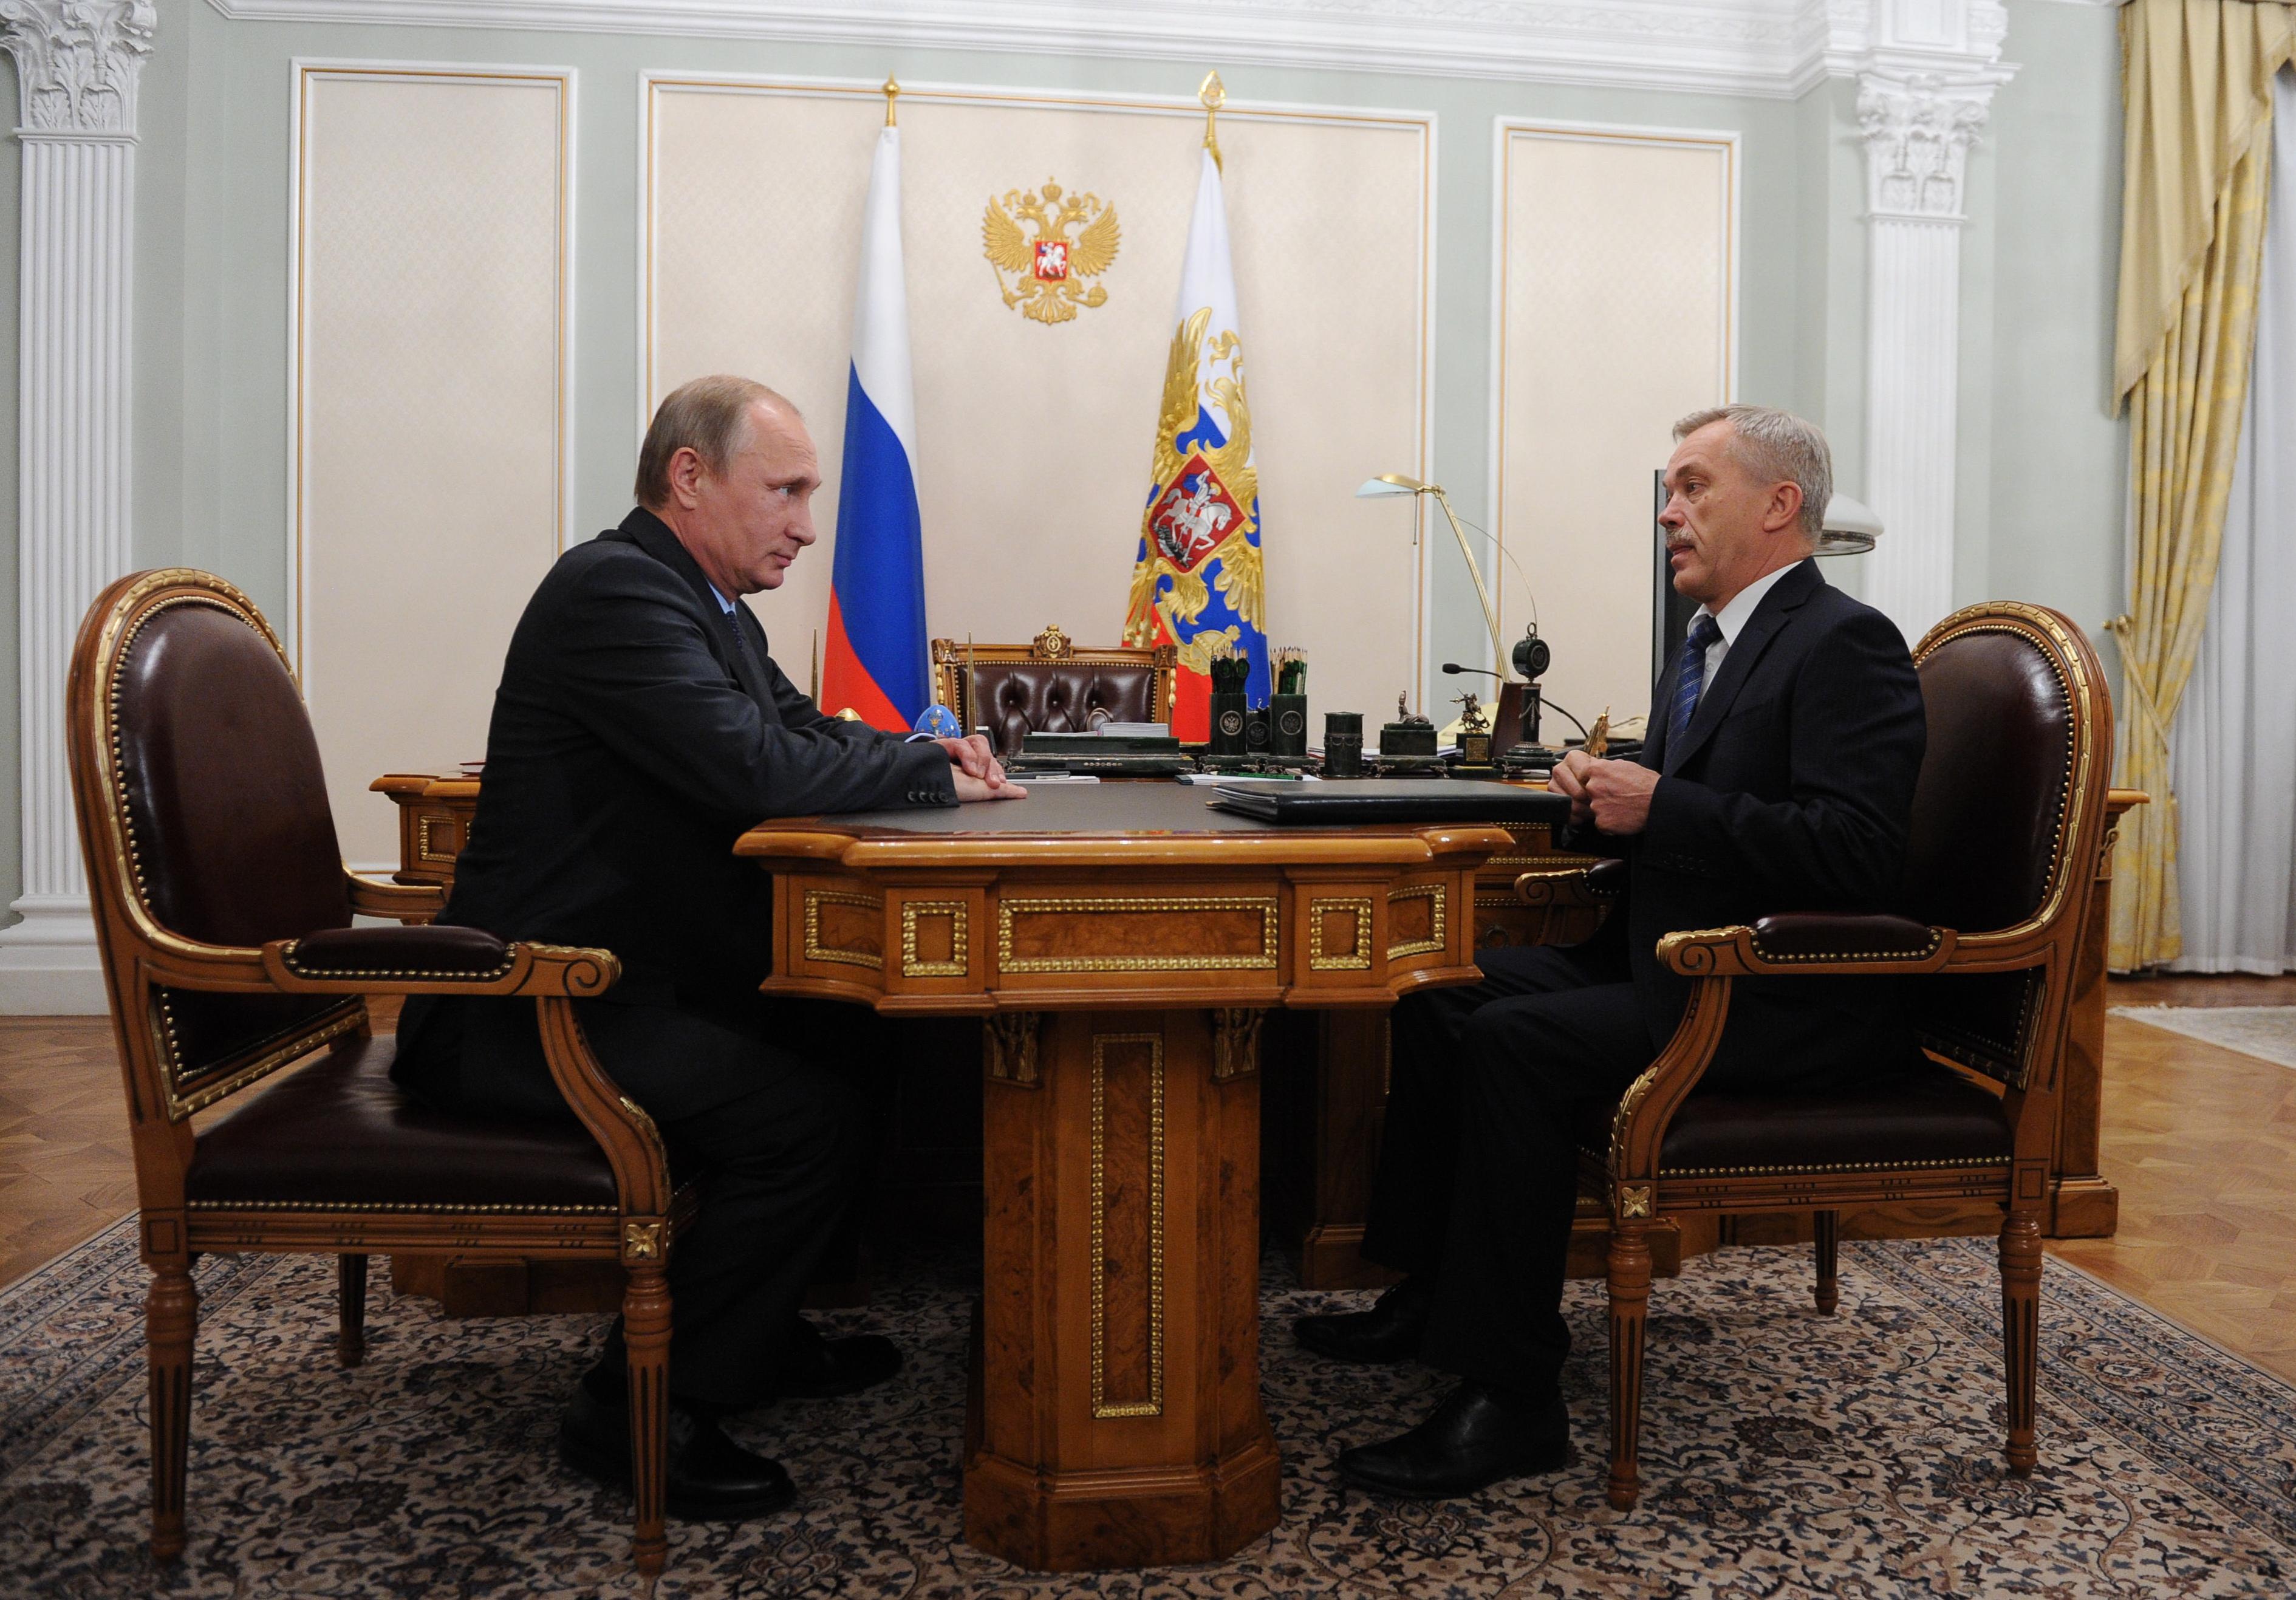 Президент РФ В.Путин на встречи с губернатором Белгородской области Е.Савченко